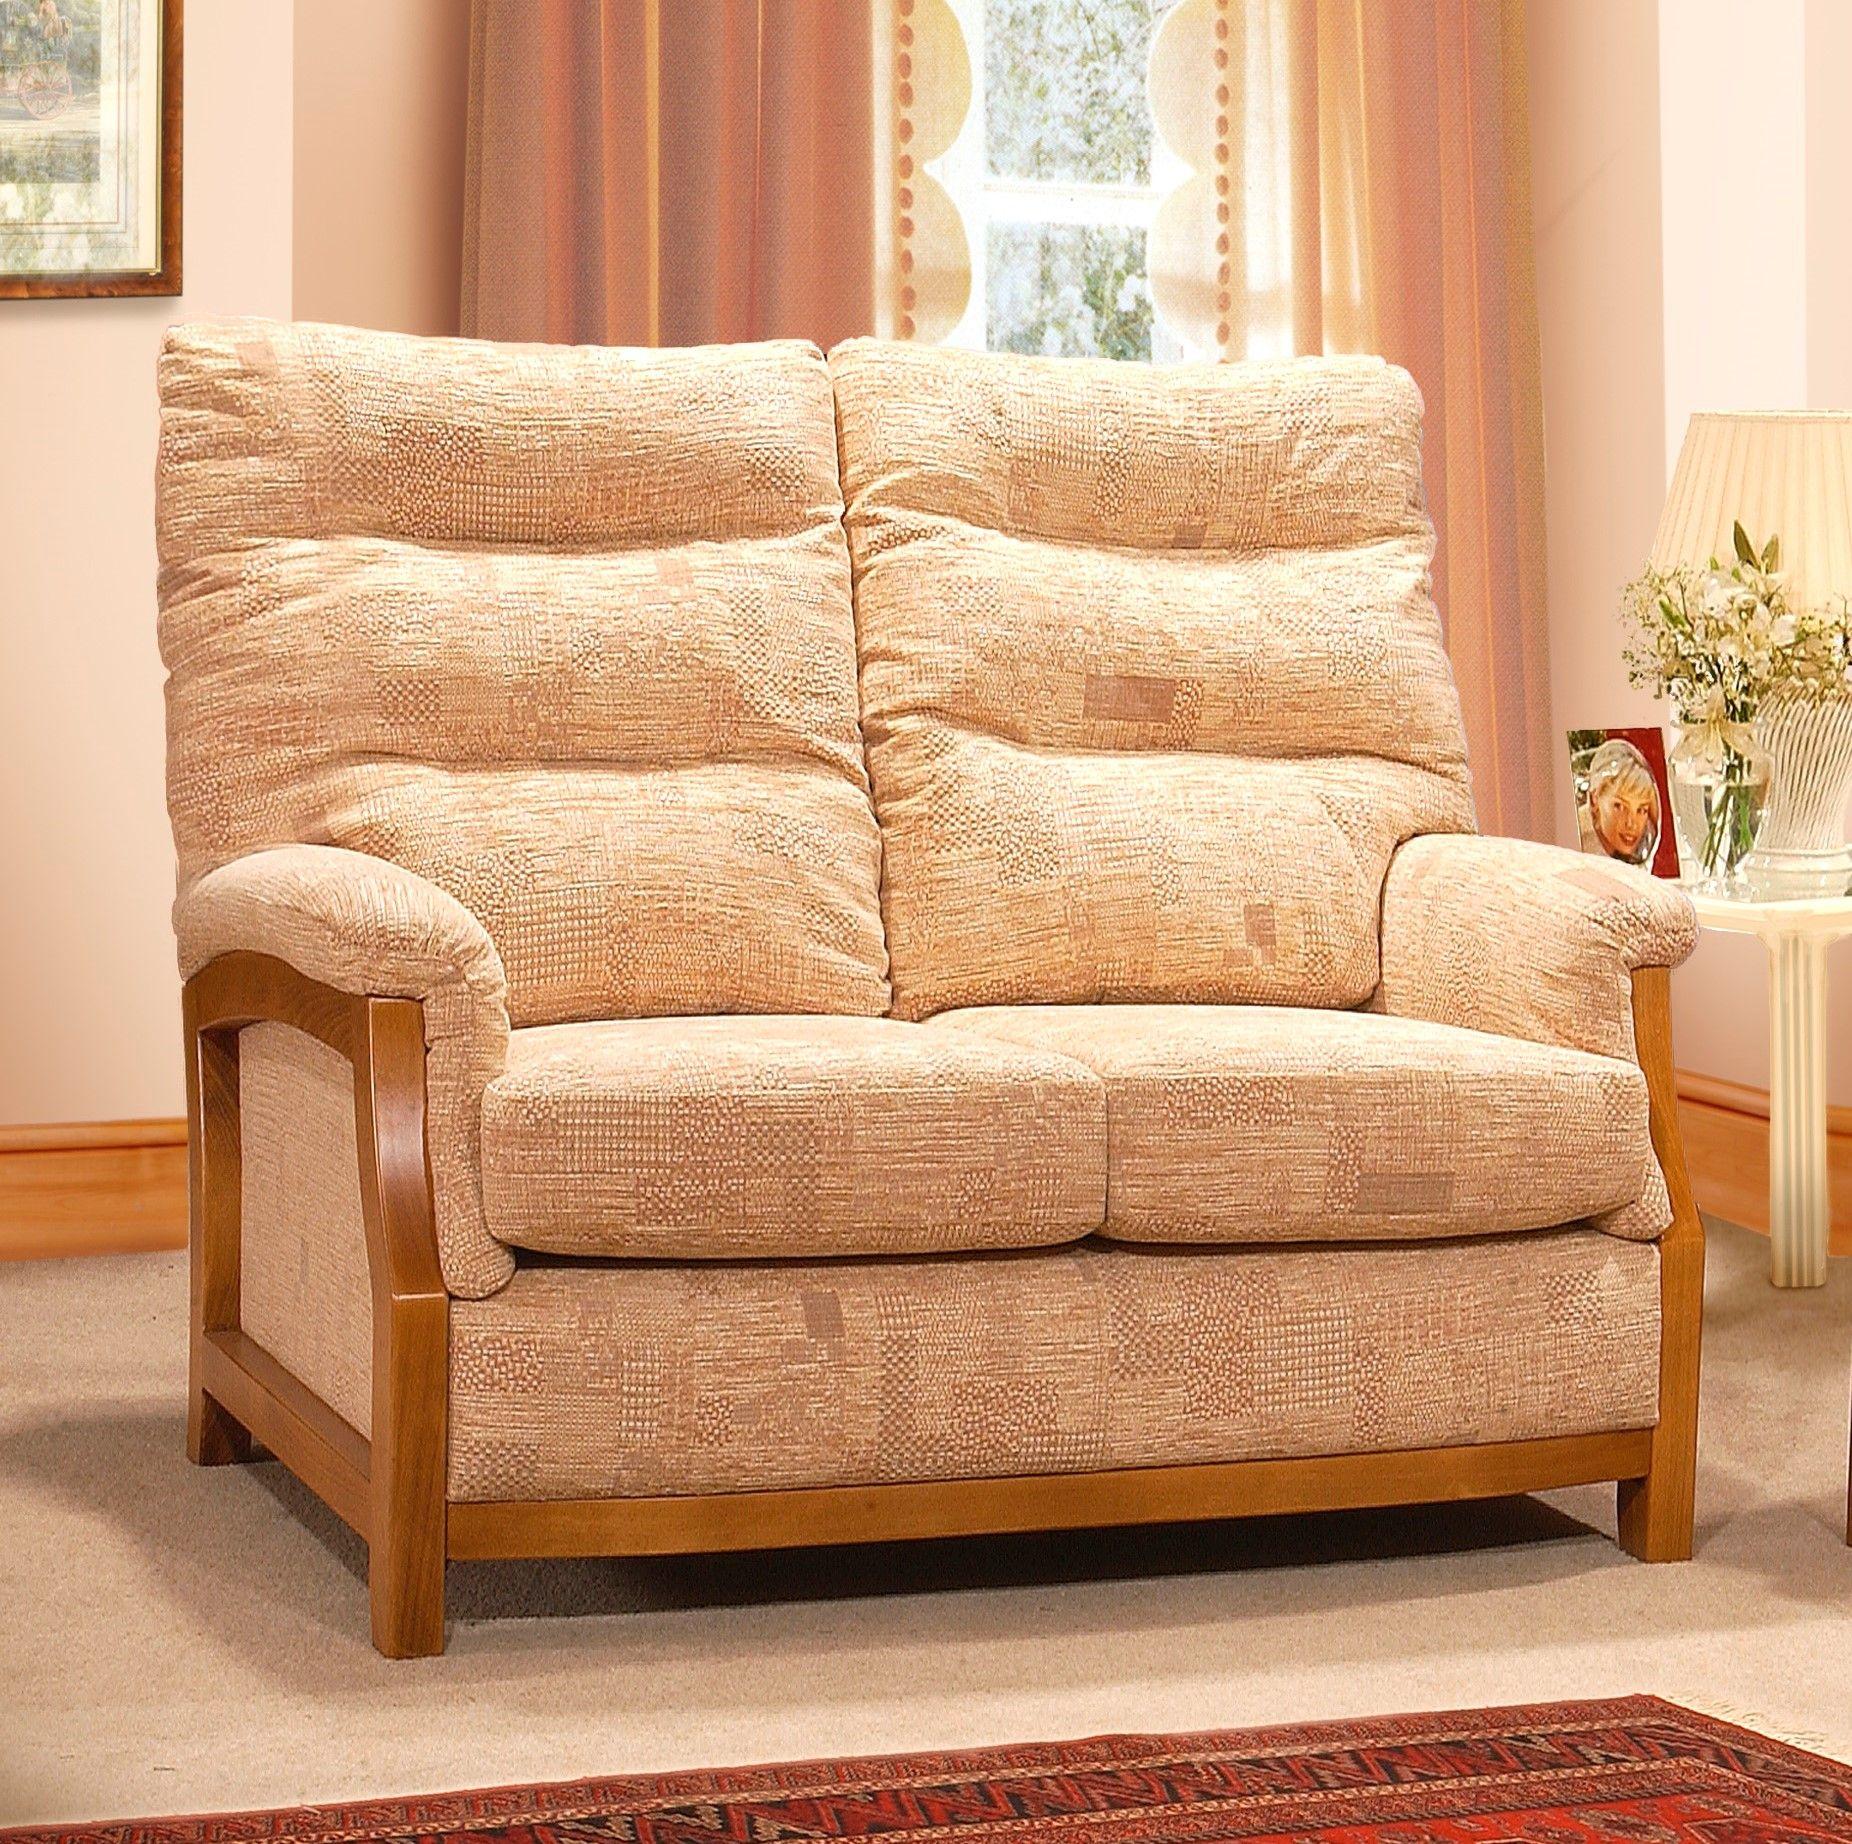 Yeoman Upholstery Sienna 2 Seater Sofa Small Sofas